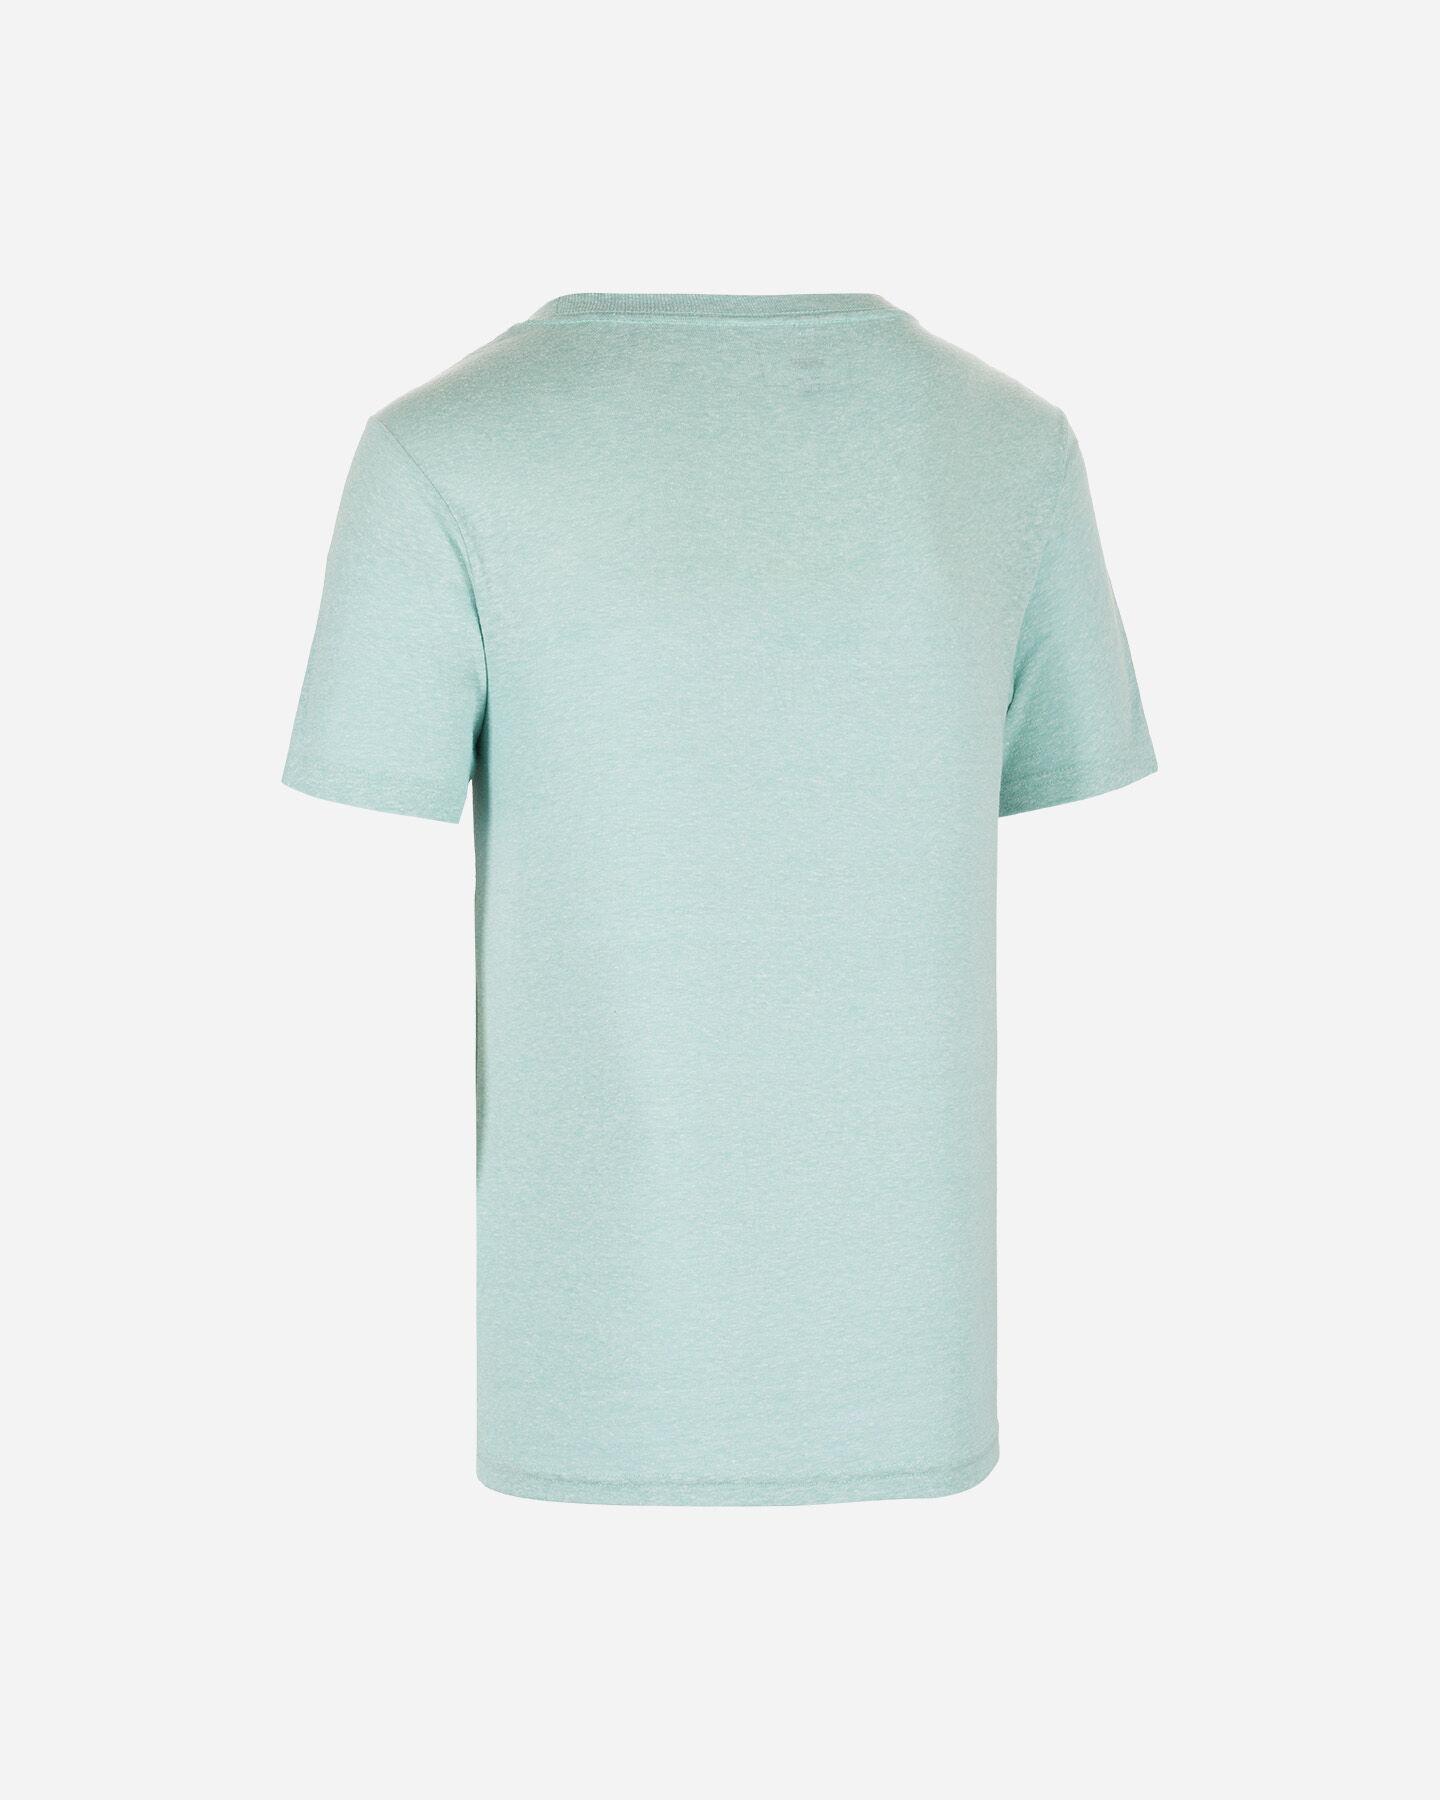 T-Shirt VANS CLASSIC M S5186511 scatto 1